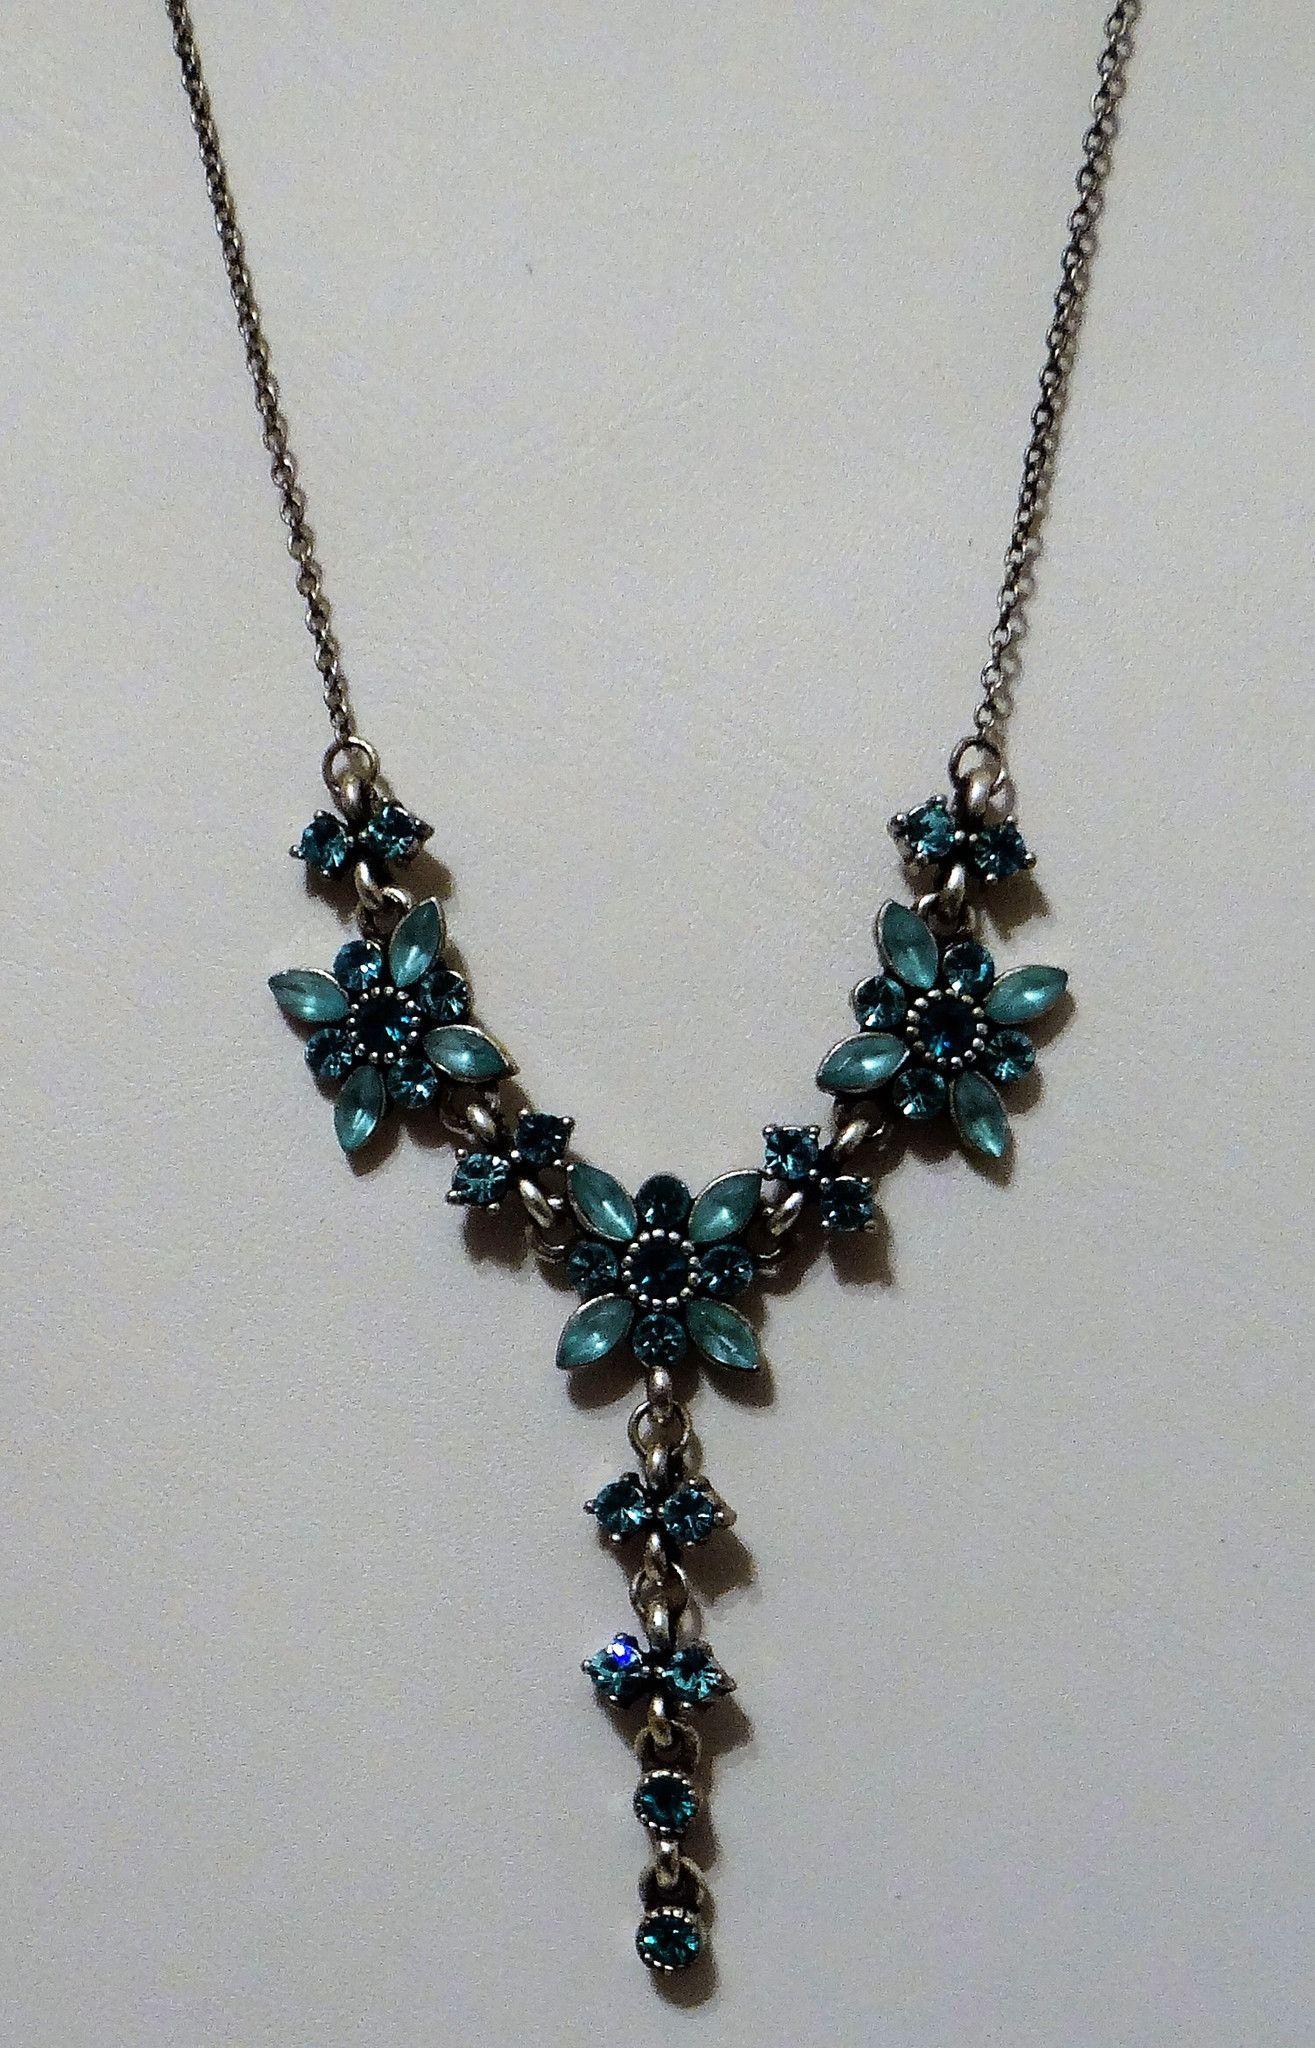 Rhinestone Blue Flower Vintage Necklace with Drop